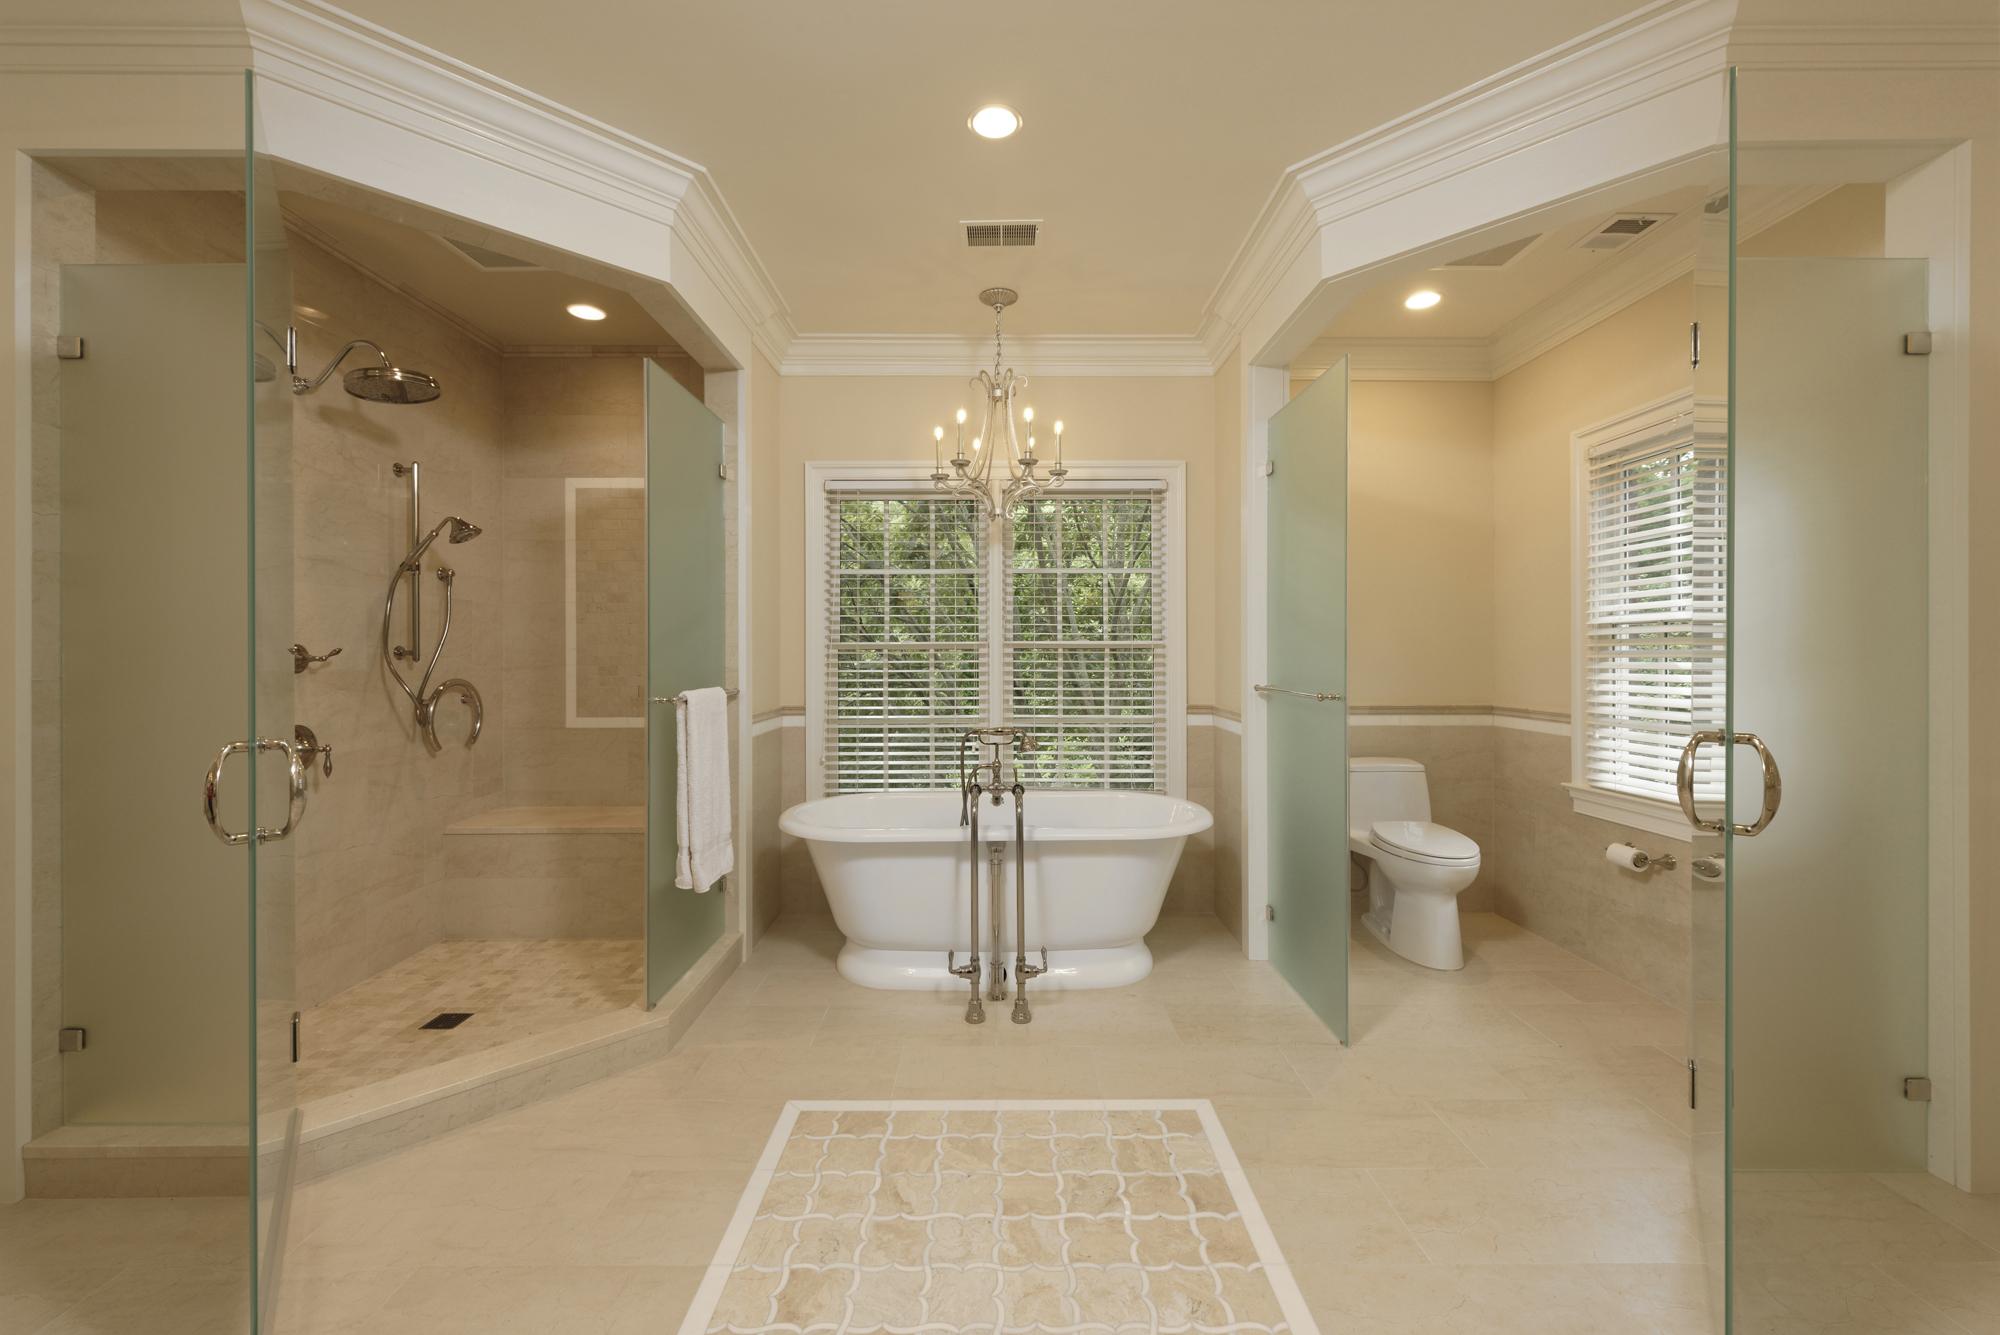 bathroom renovations - Bathroom Remodeling Bethesda Md